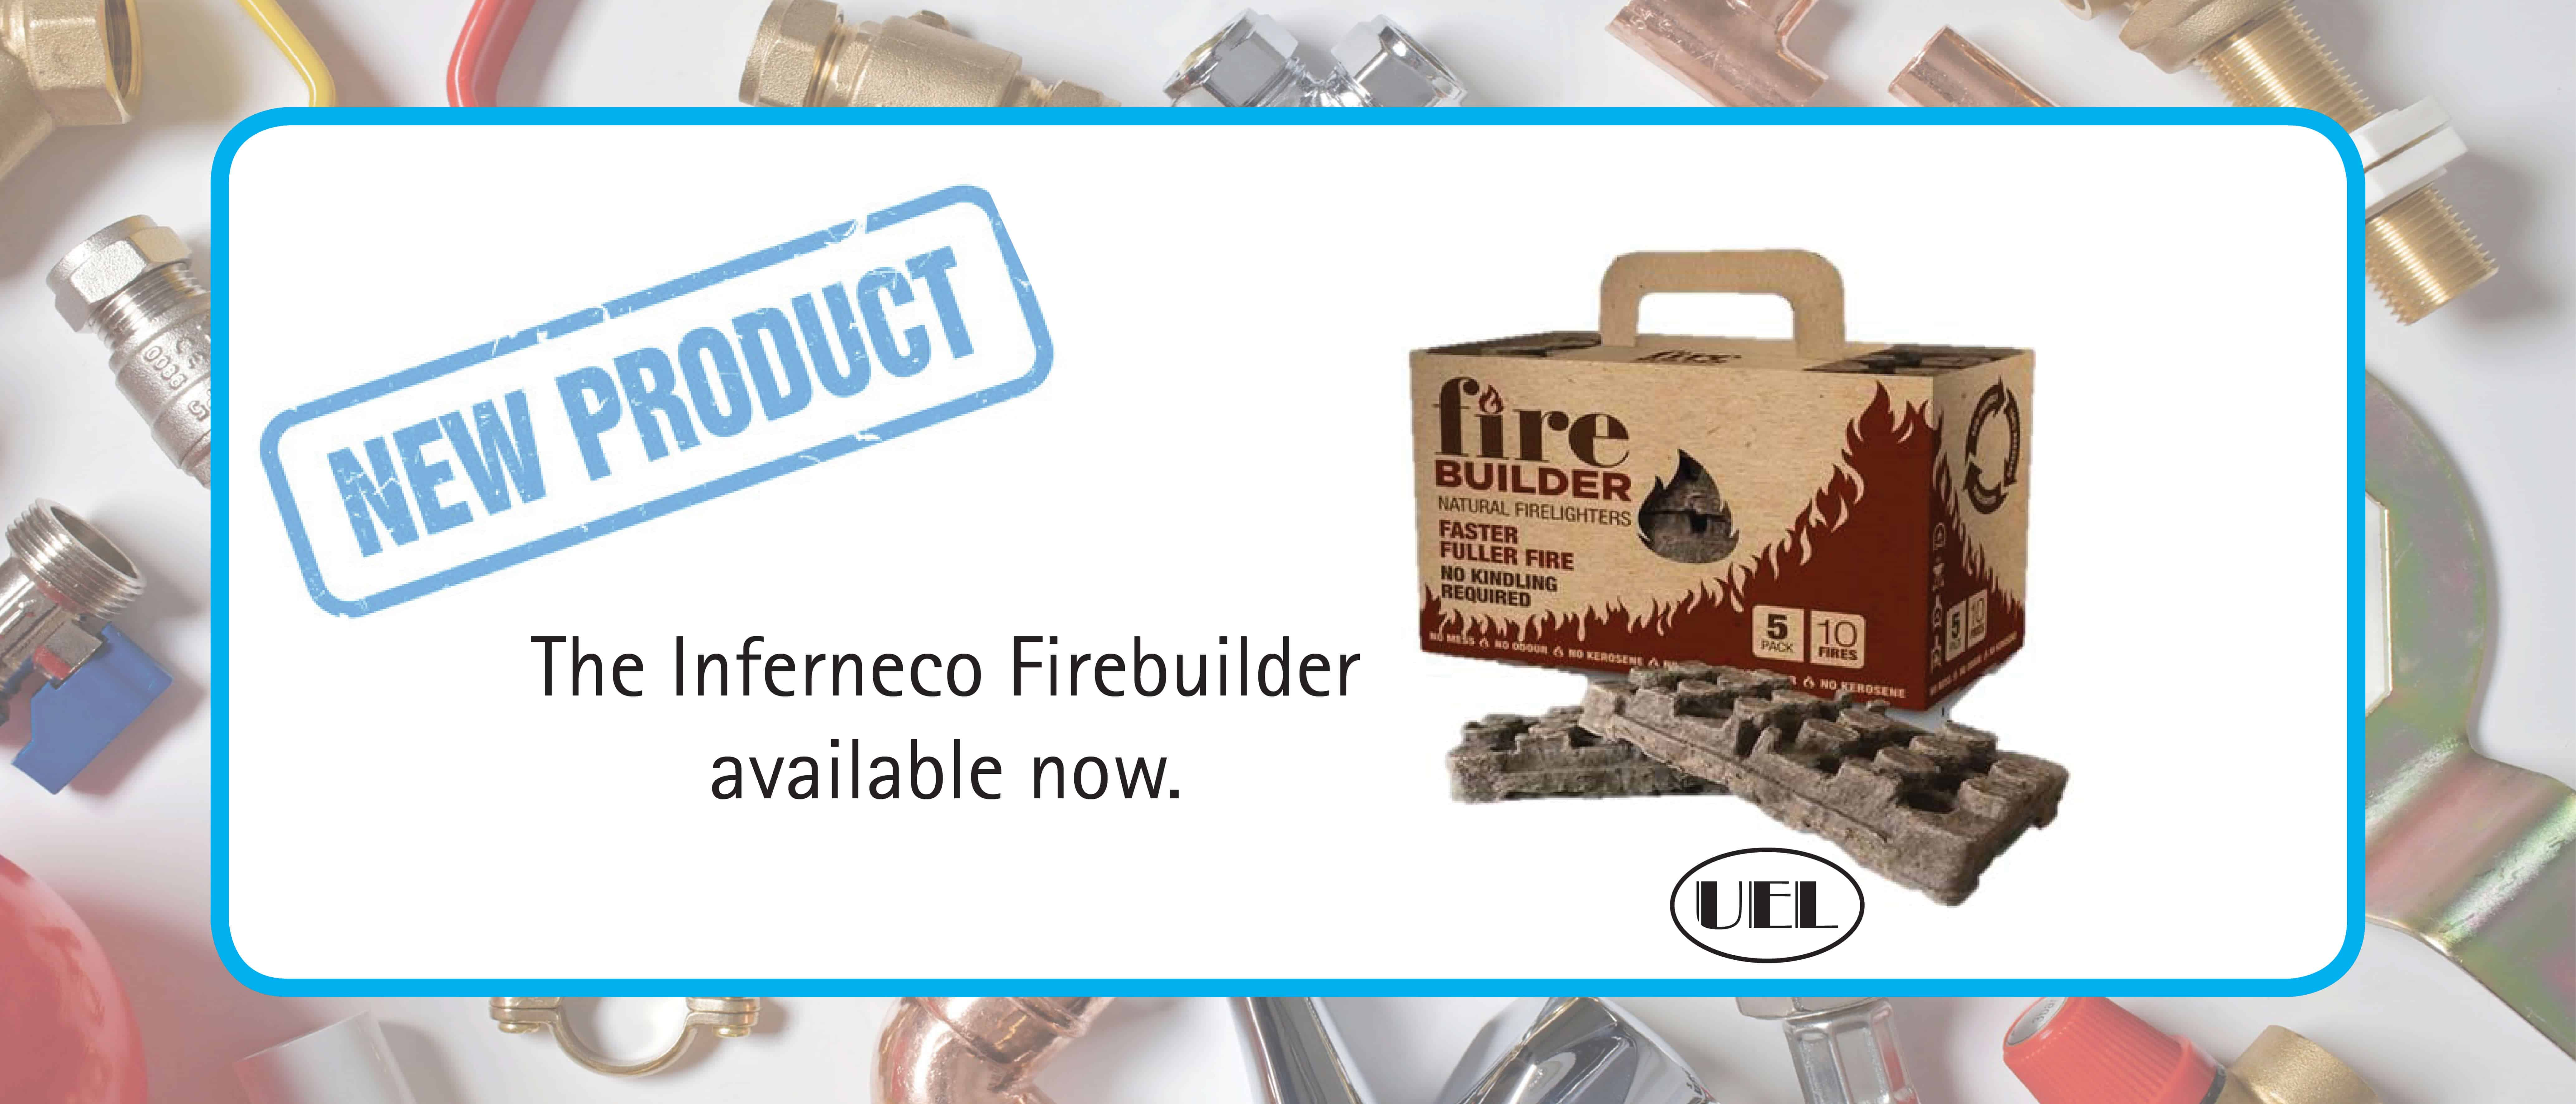 New Product Alert – The Inferneco Firebuilder